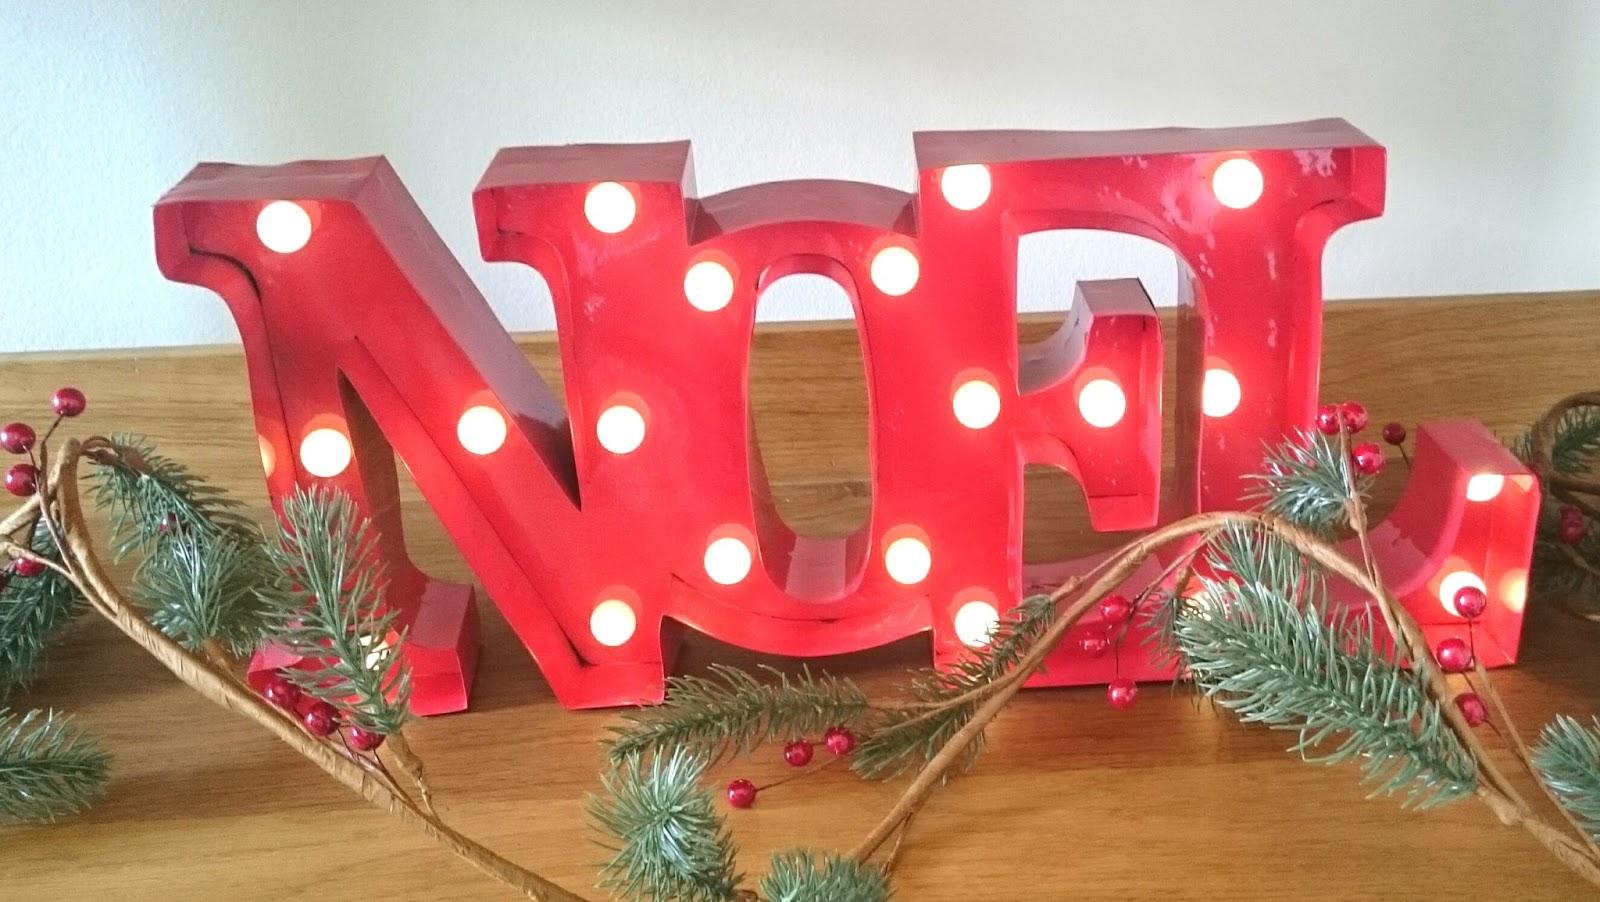 George Asda Christmas Event